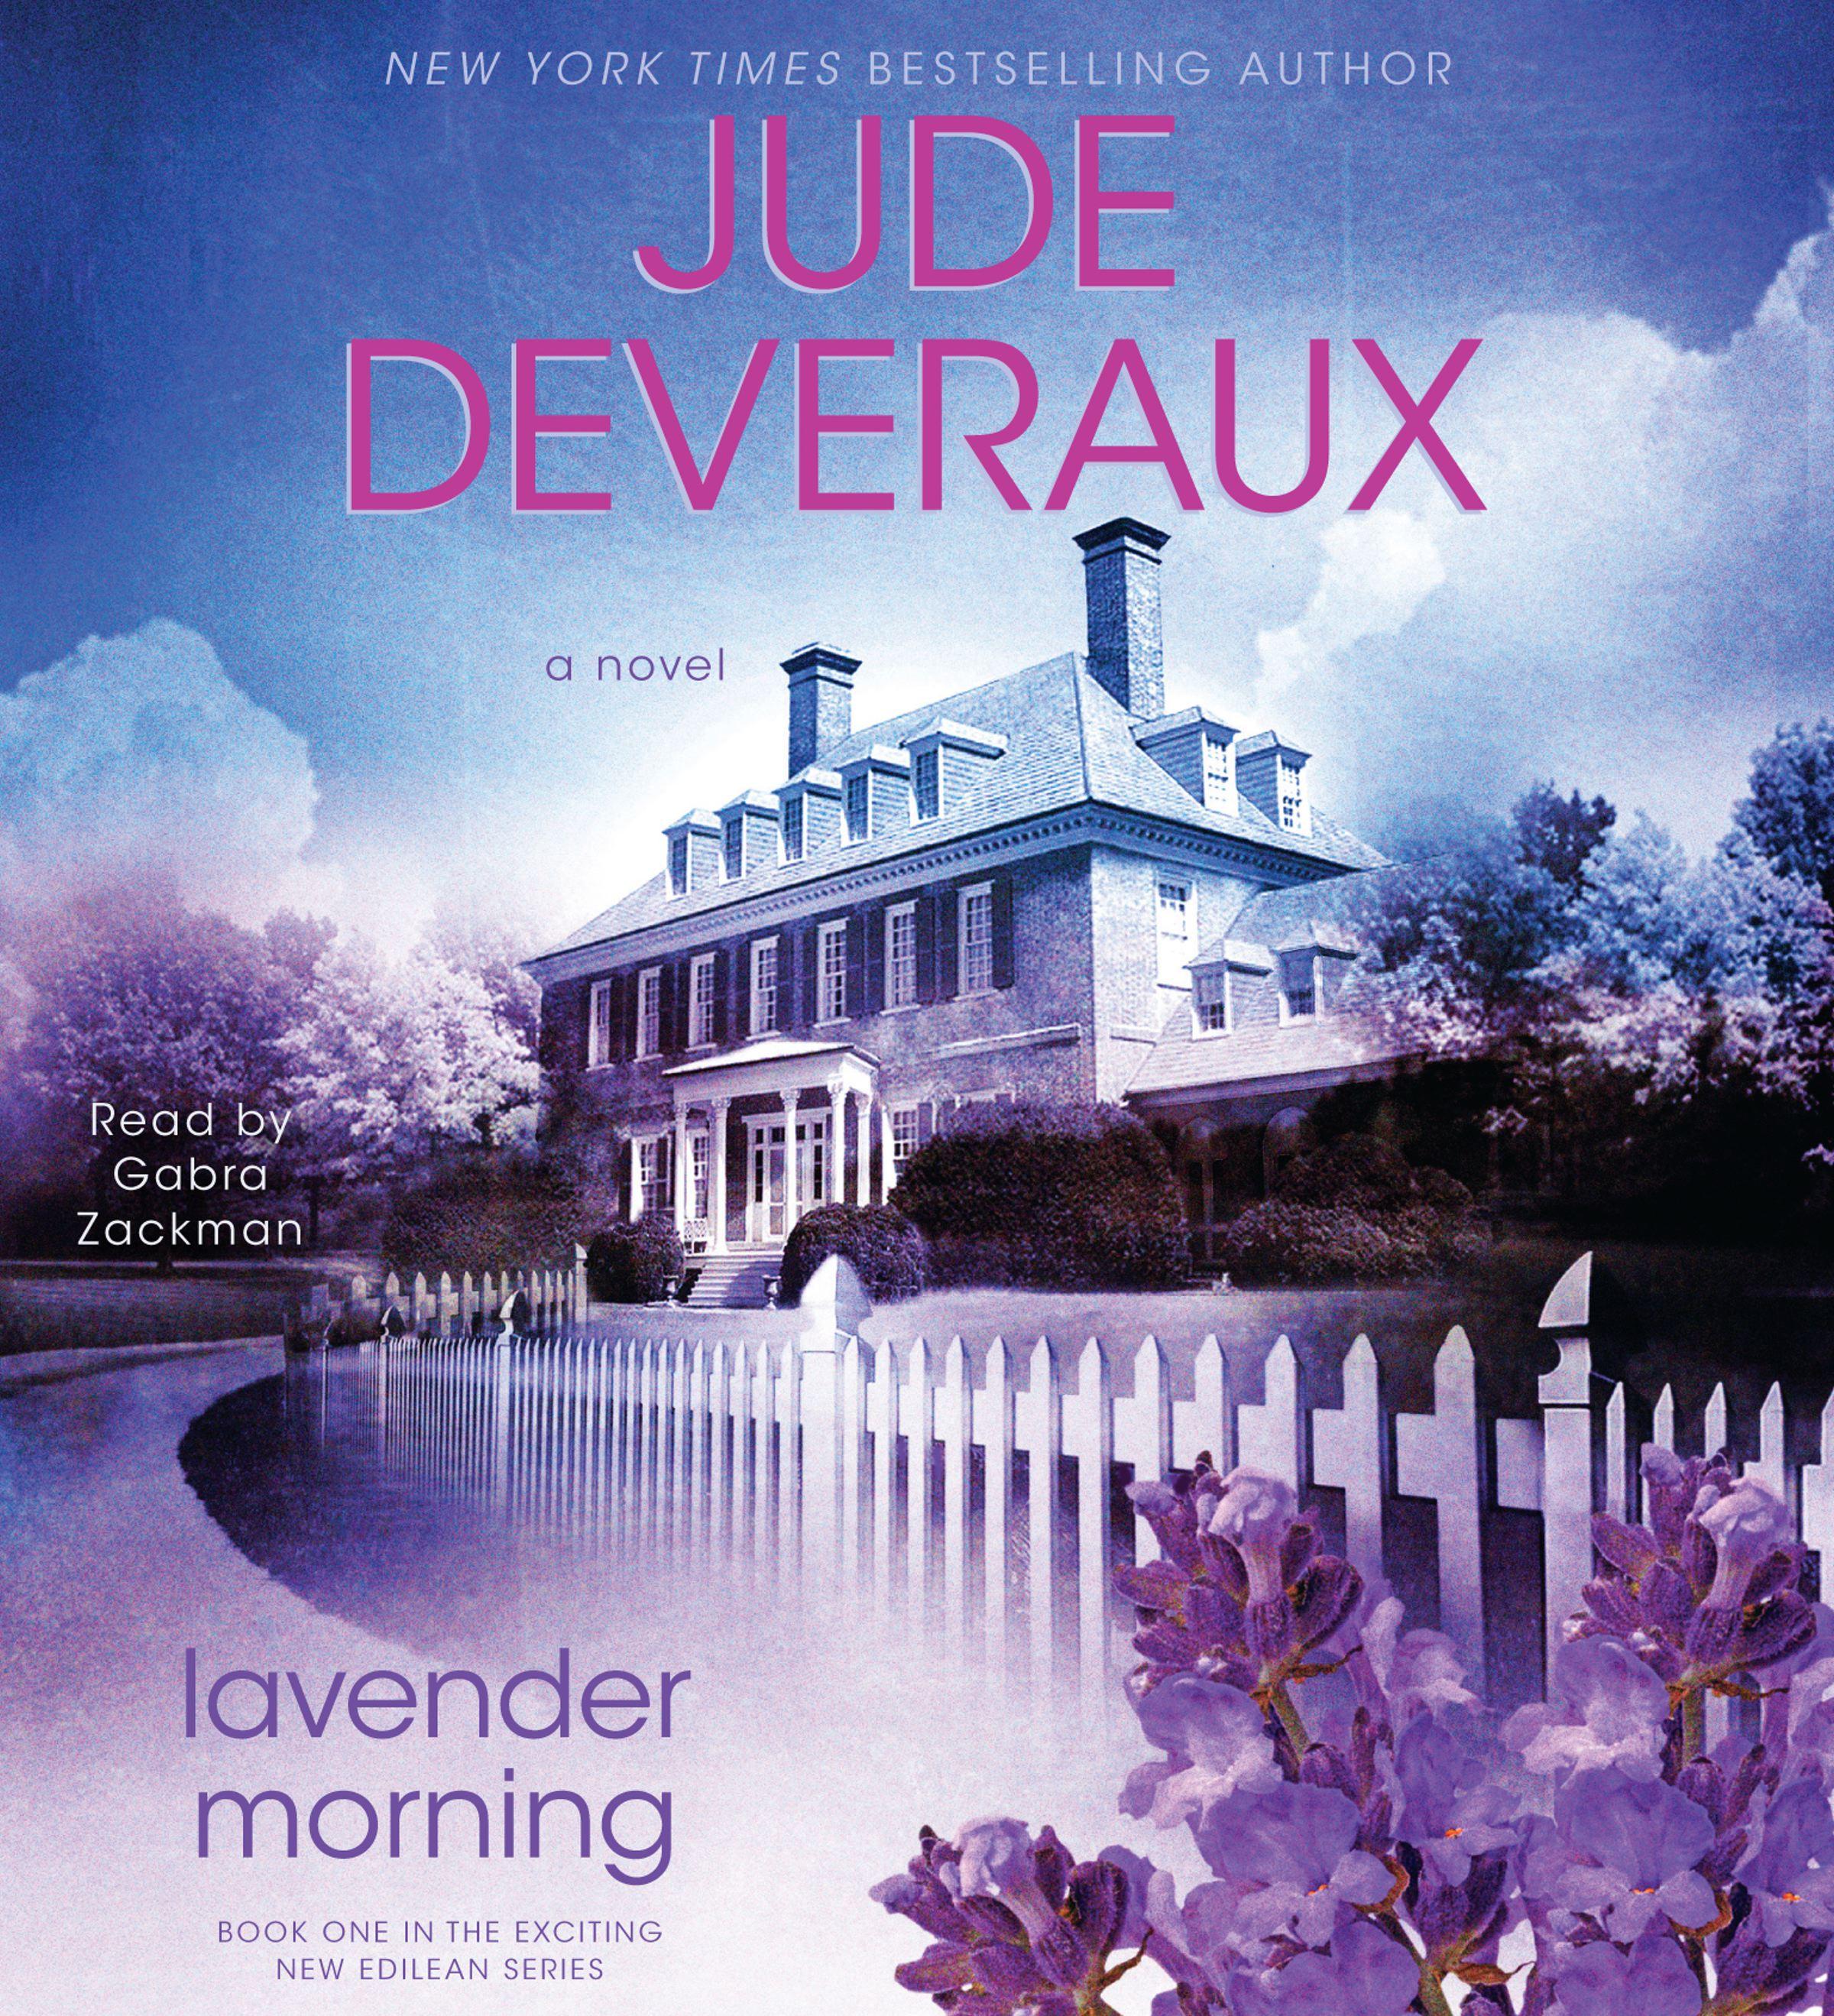 Lavender morning 9780743579728 hr